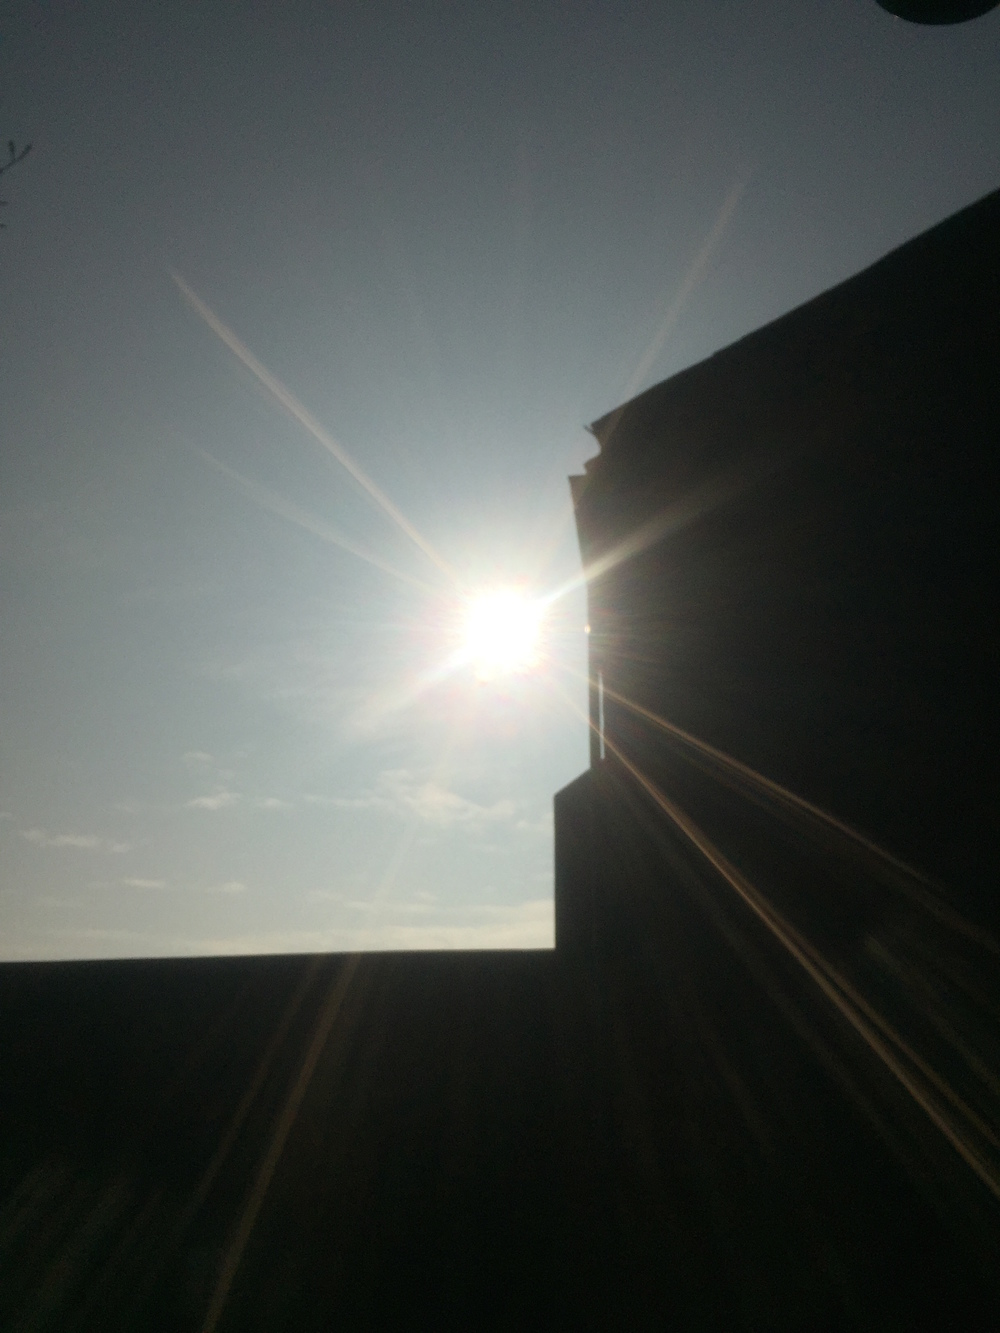 frillyindustries-eclipse01.jpg